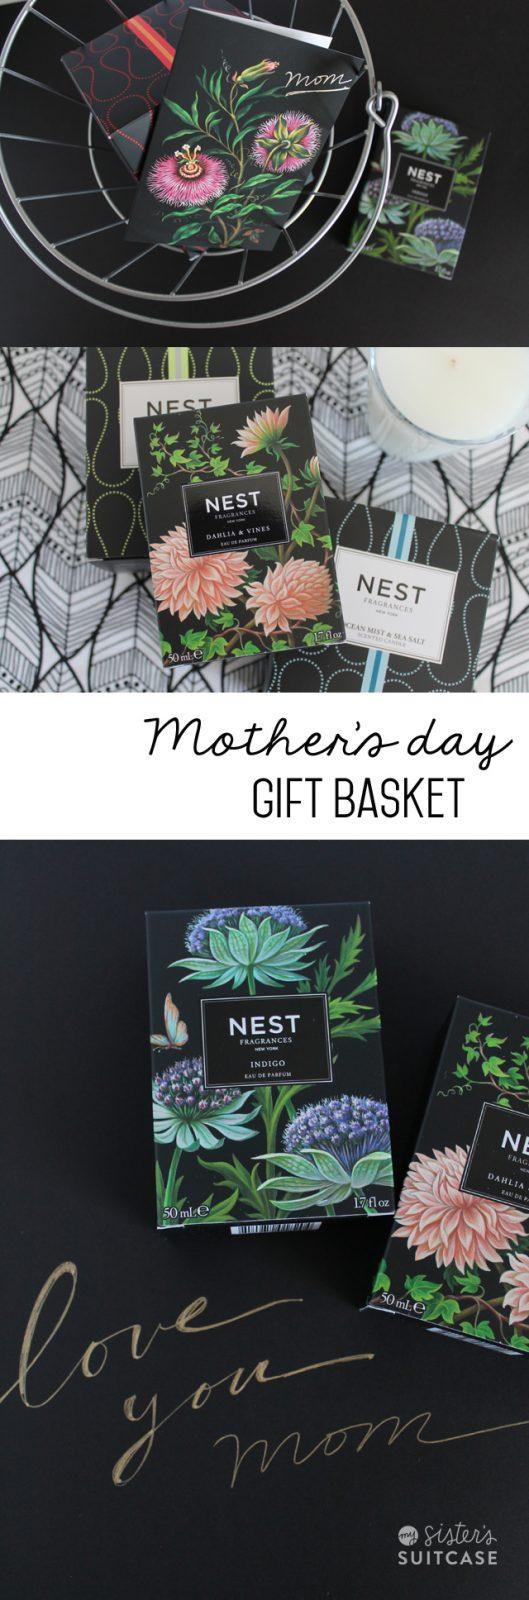 mothers day fragrance gift basket